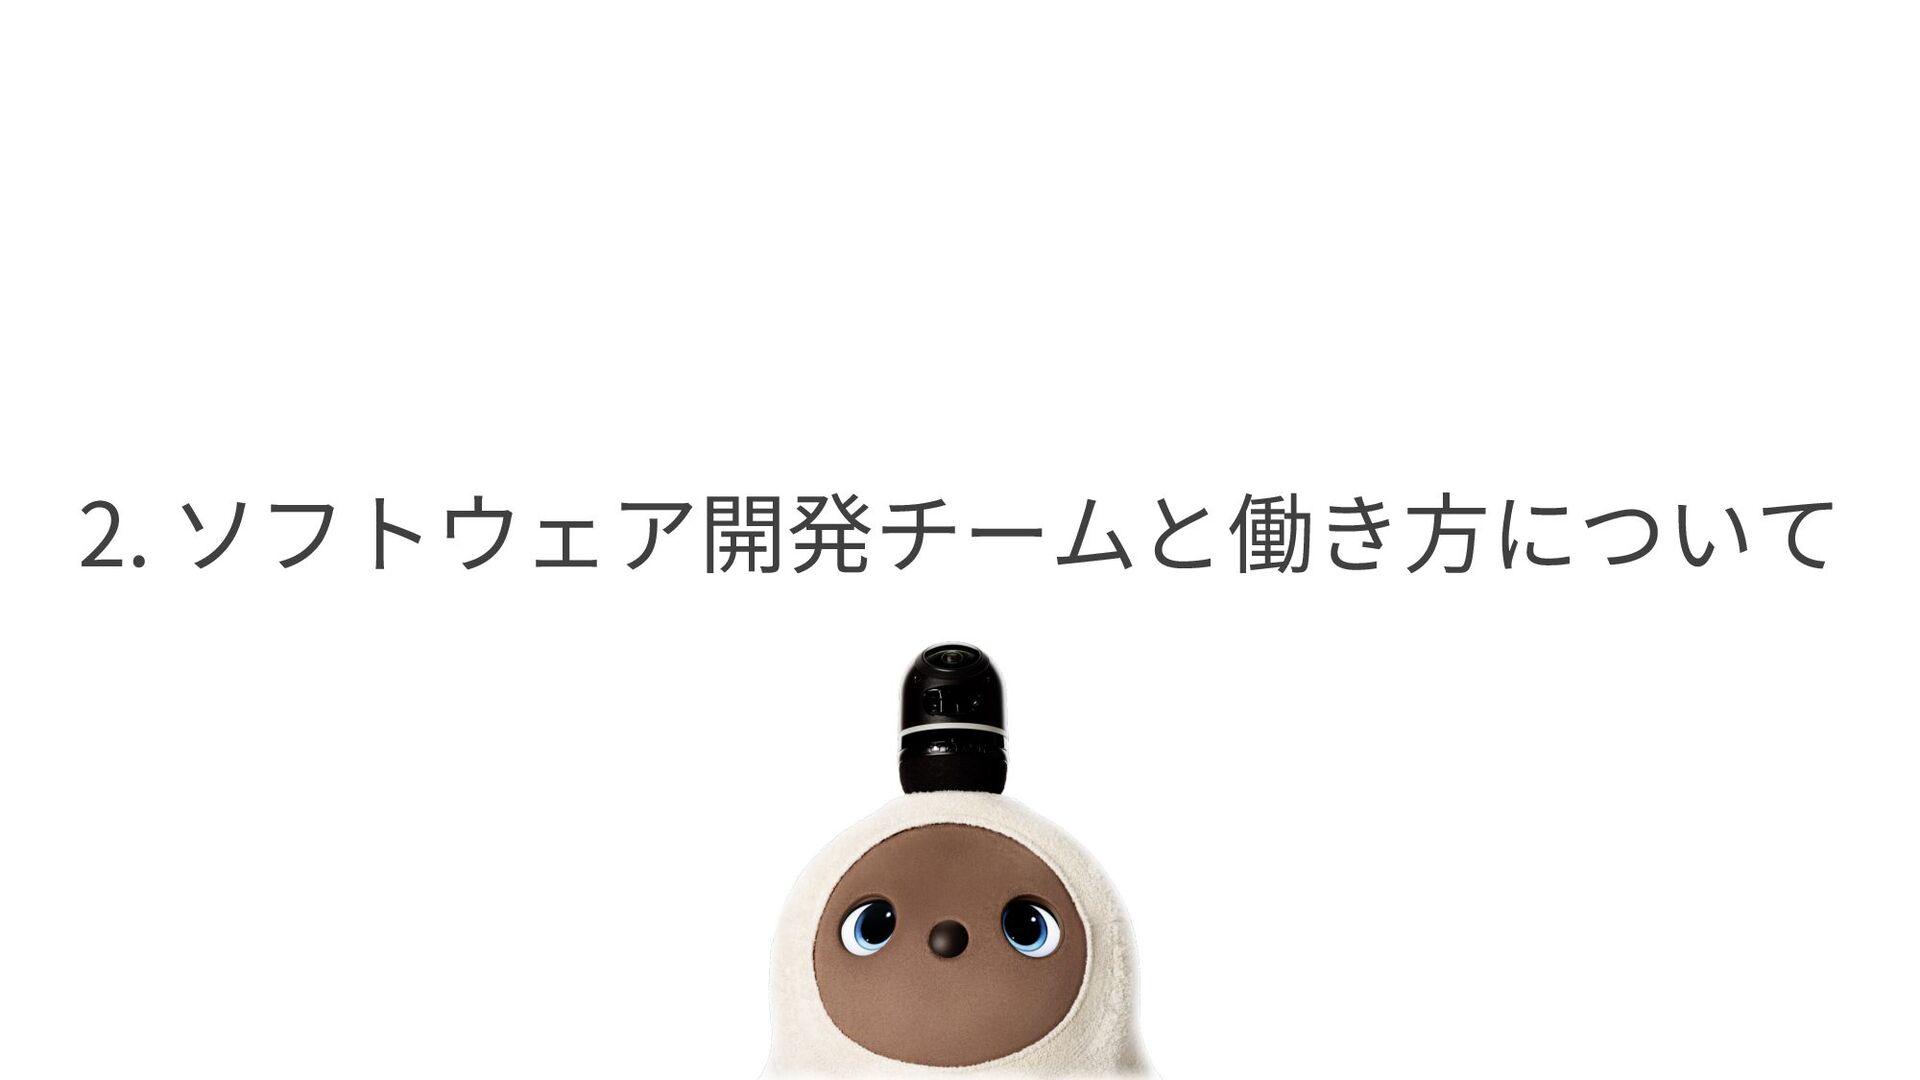 1. GROOVE XとLOVOTについて グローバルにも受け入れられるLOVOT